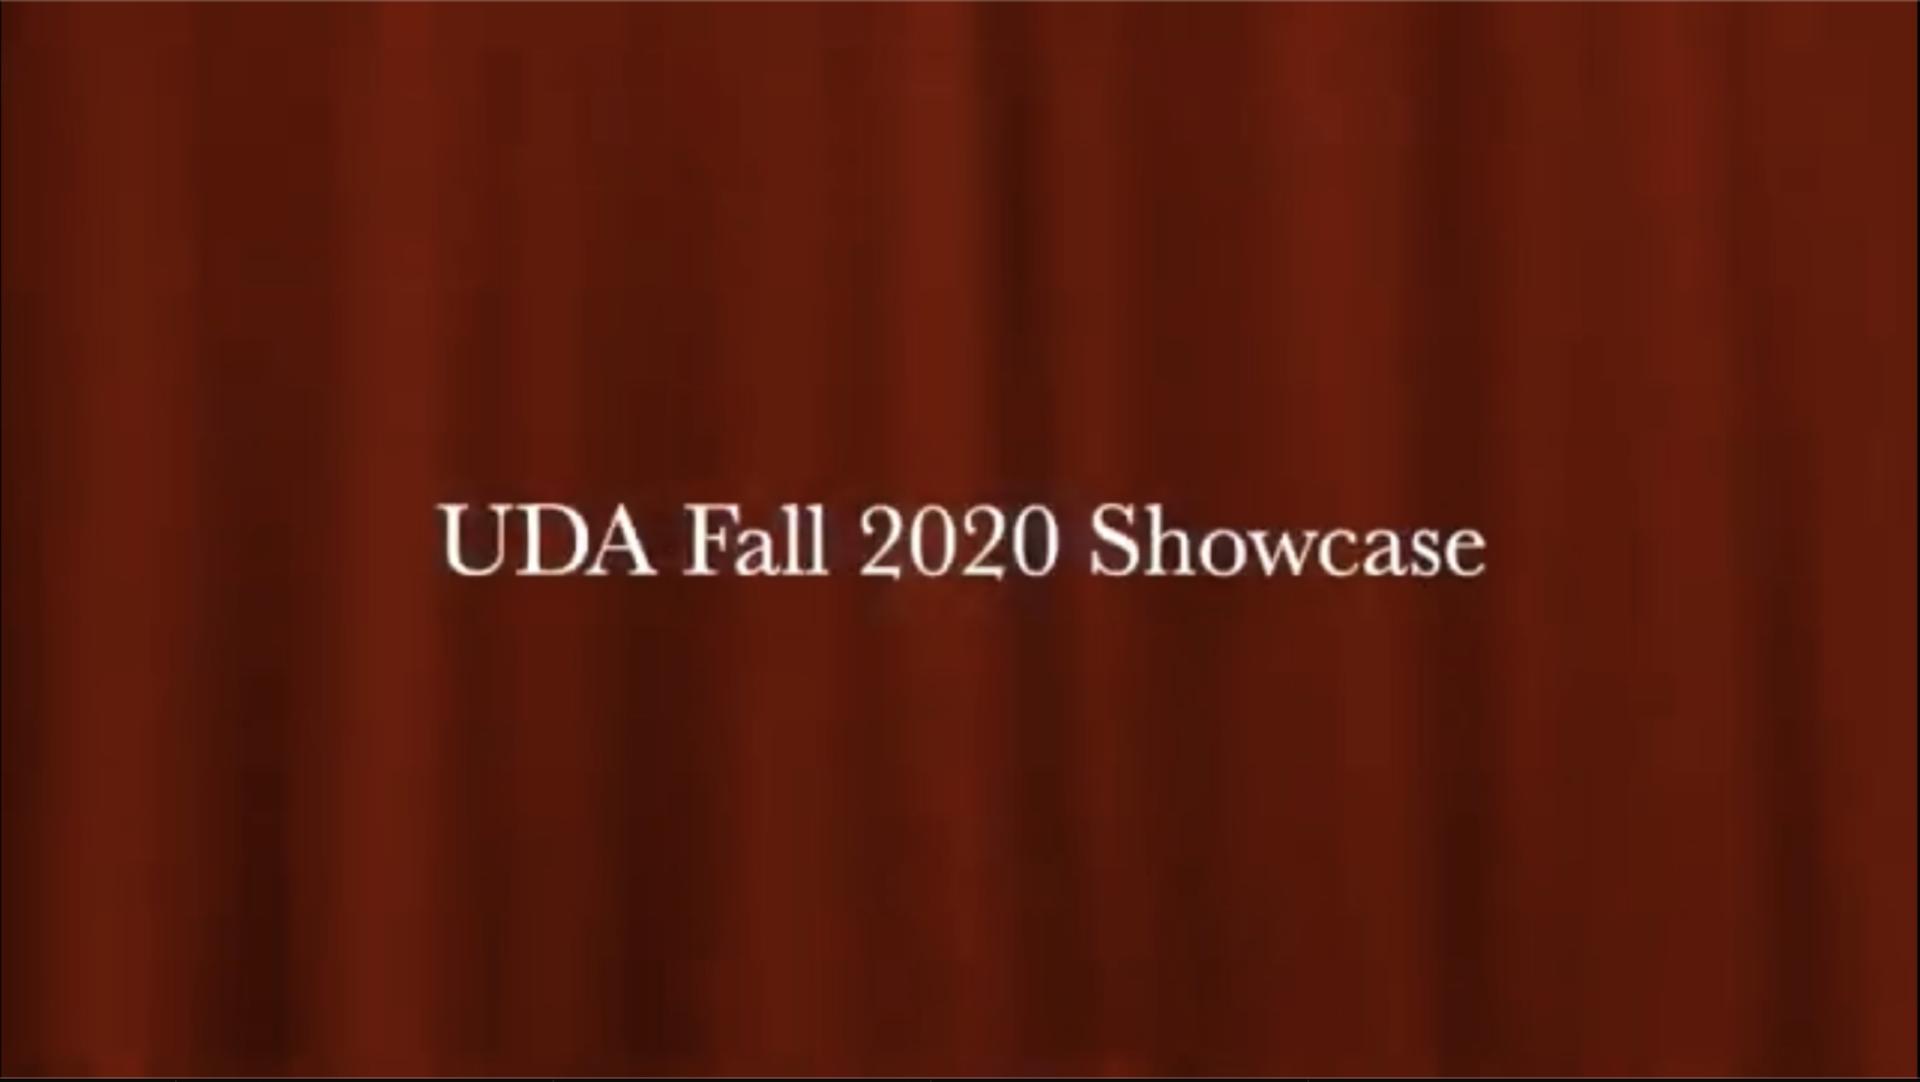 University Dance Alliance, Fall 2020 Showcase Promotional Video